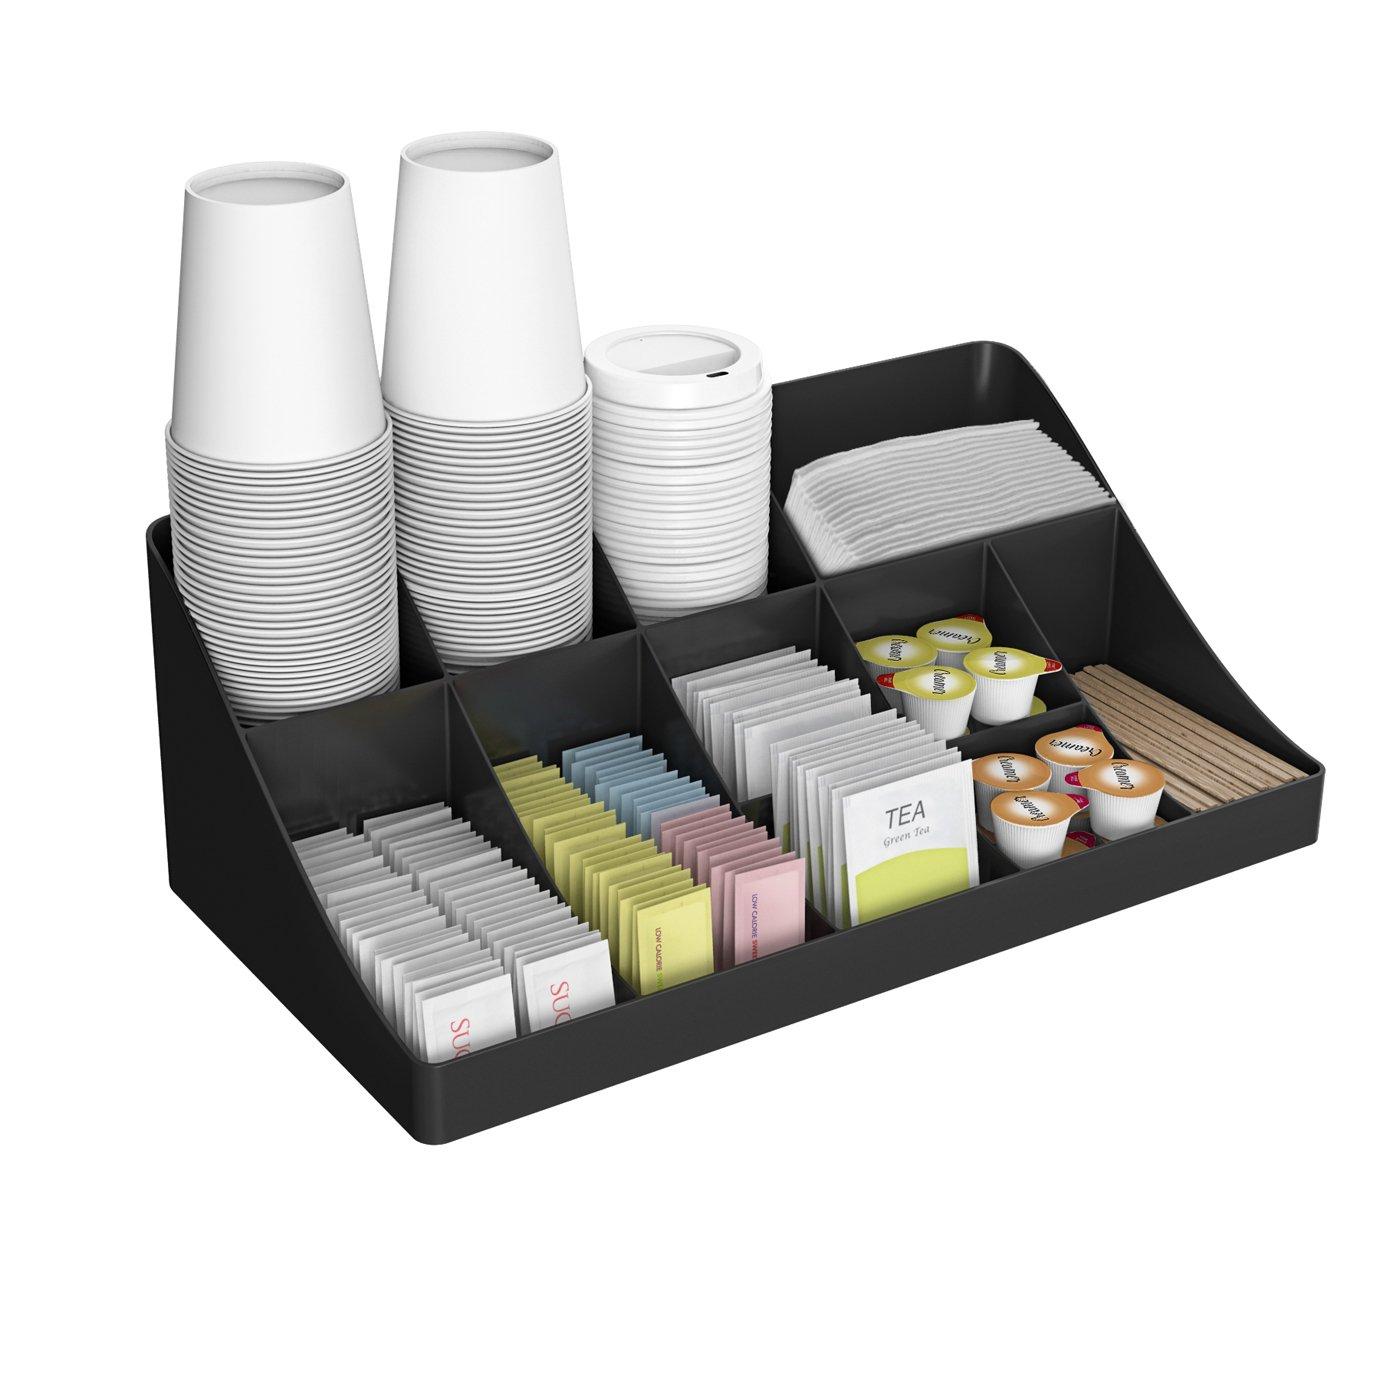 Mind Reader 11 Compartment Breakroom Coffee Condiment Organizer, Black by Mind Reader